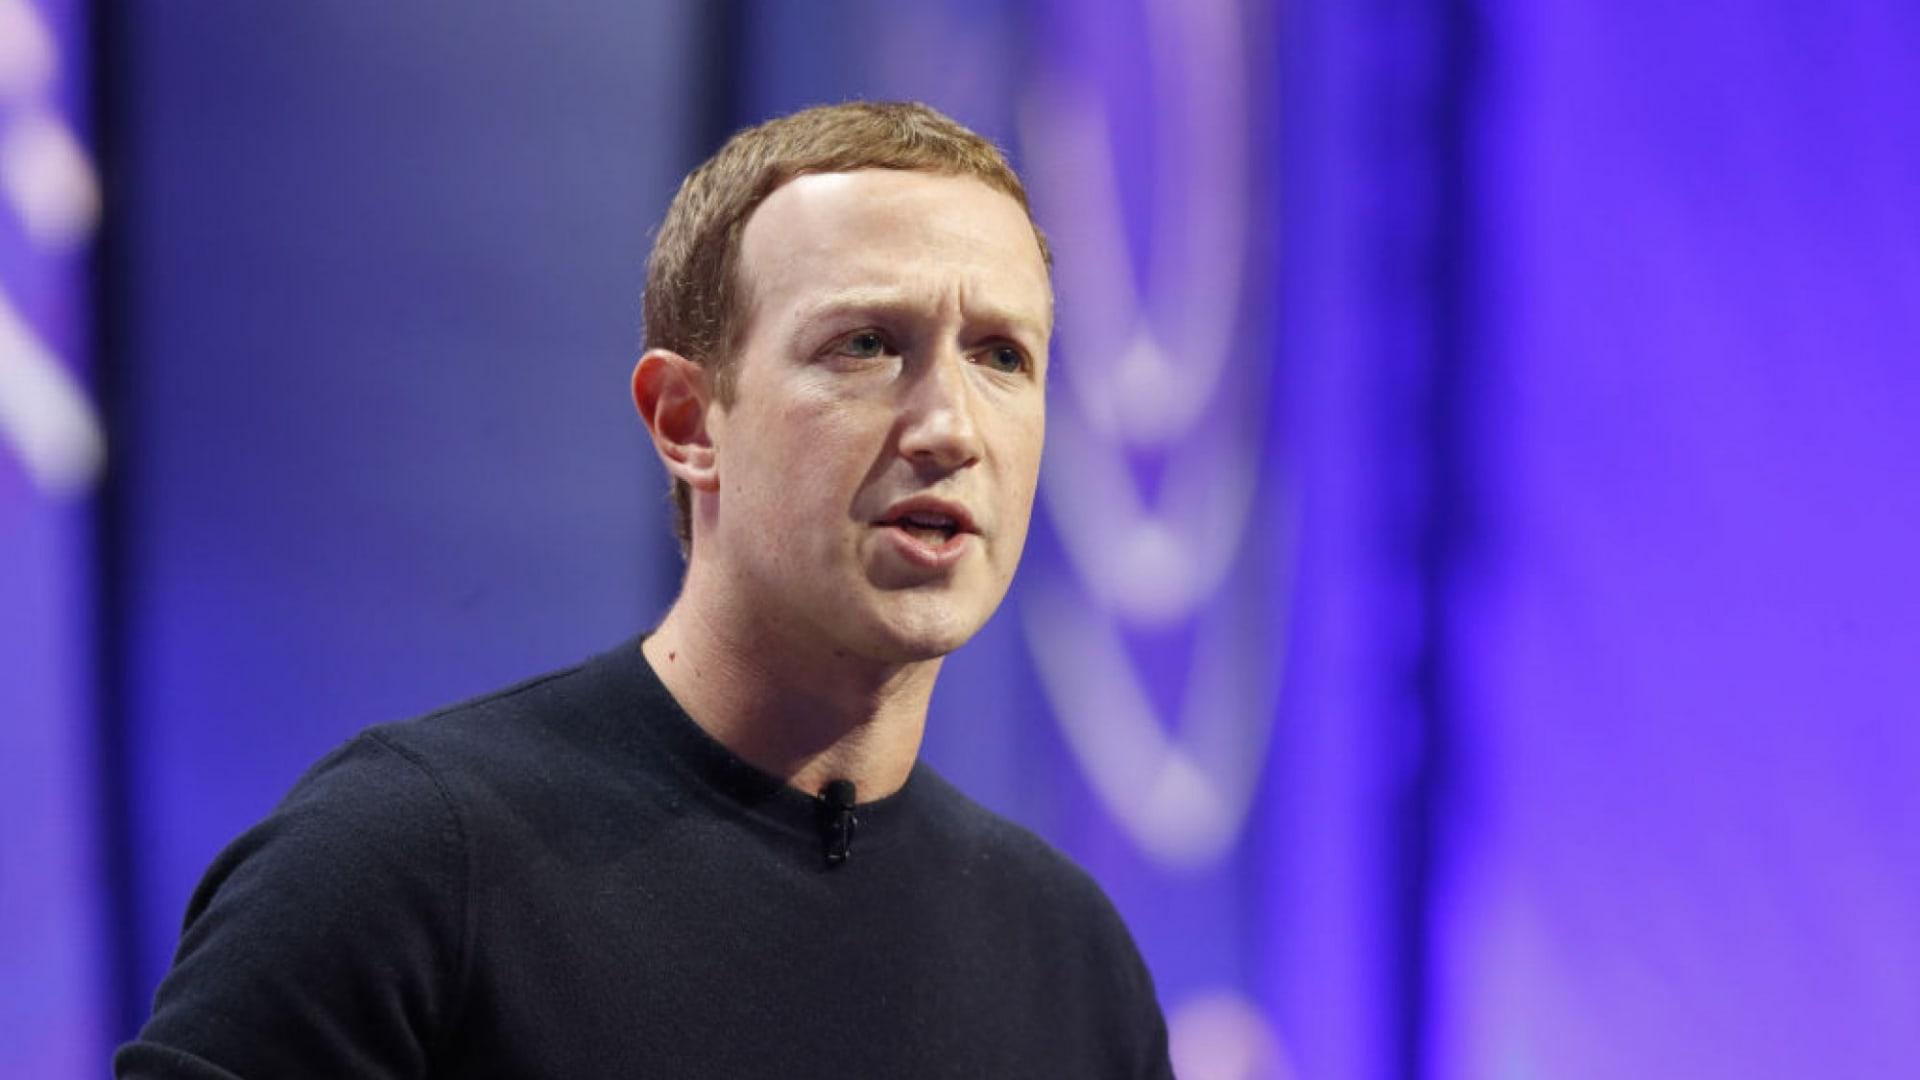 Mark Zuckerberg Says Combating Misinformation on Facebook Is Just Too Hard